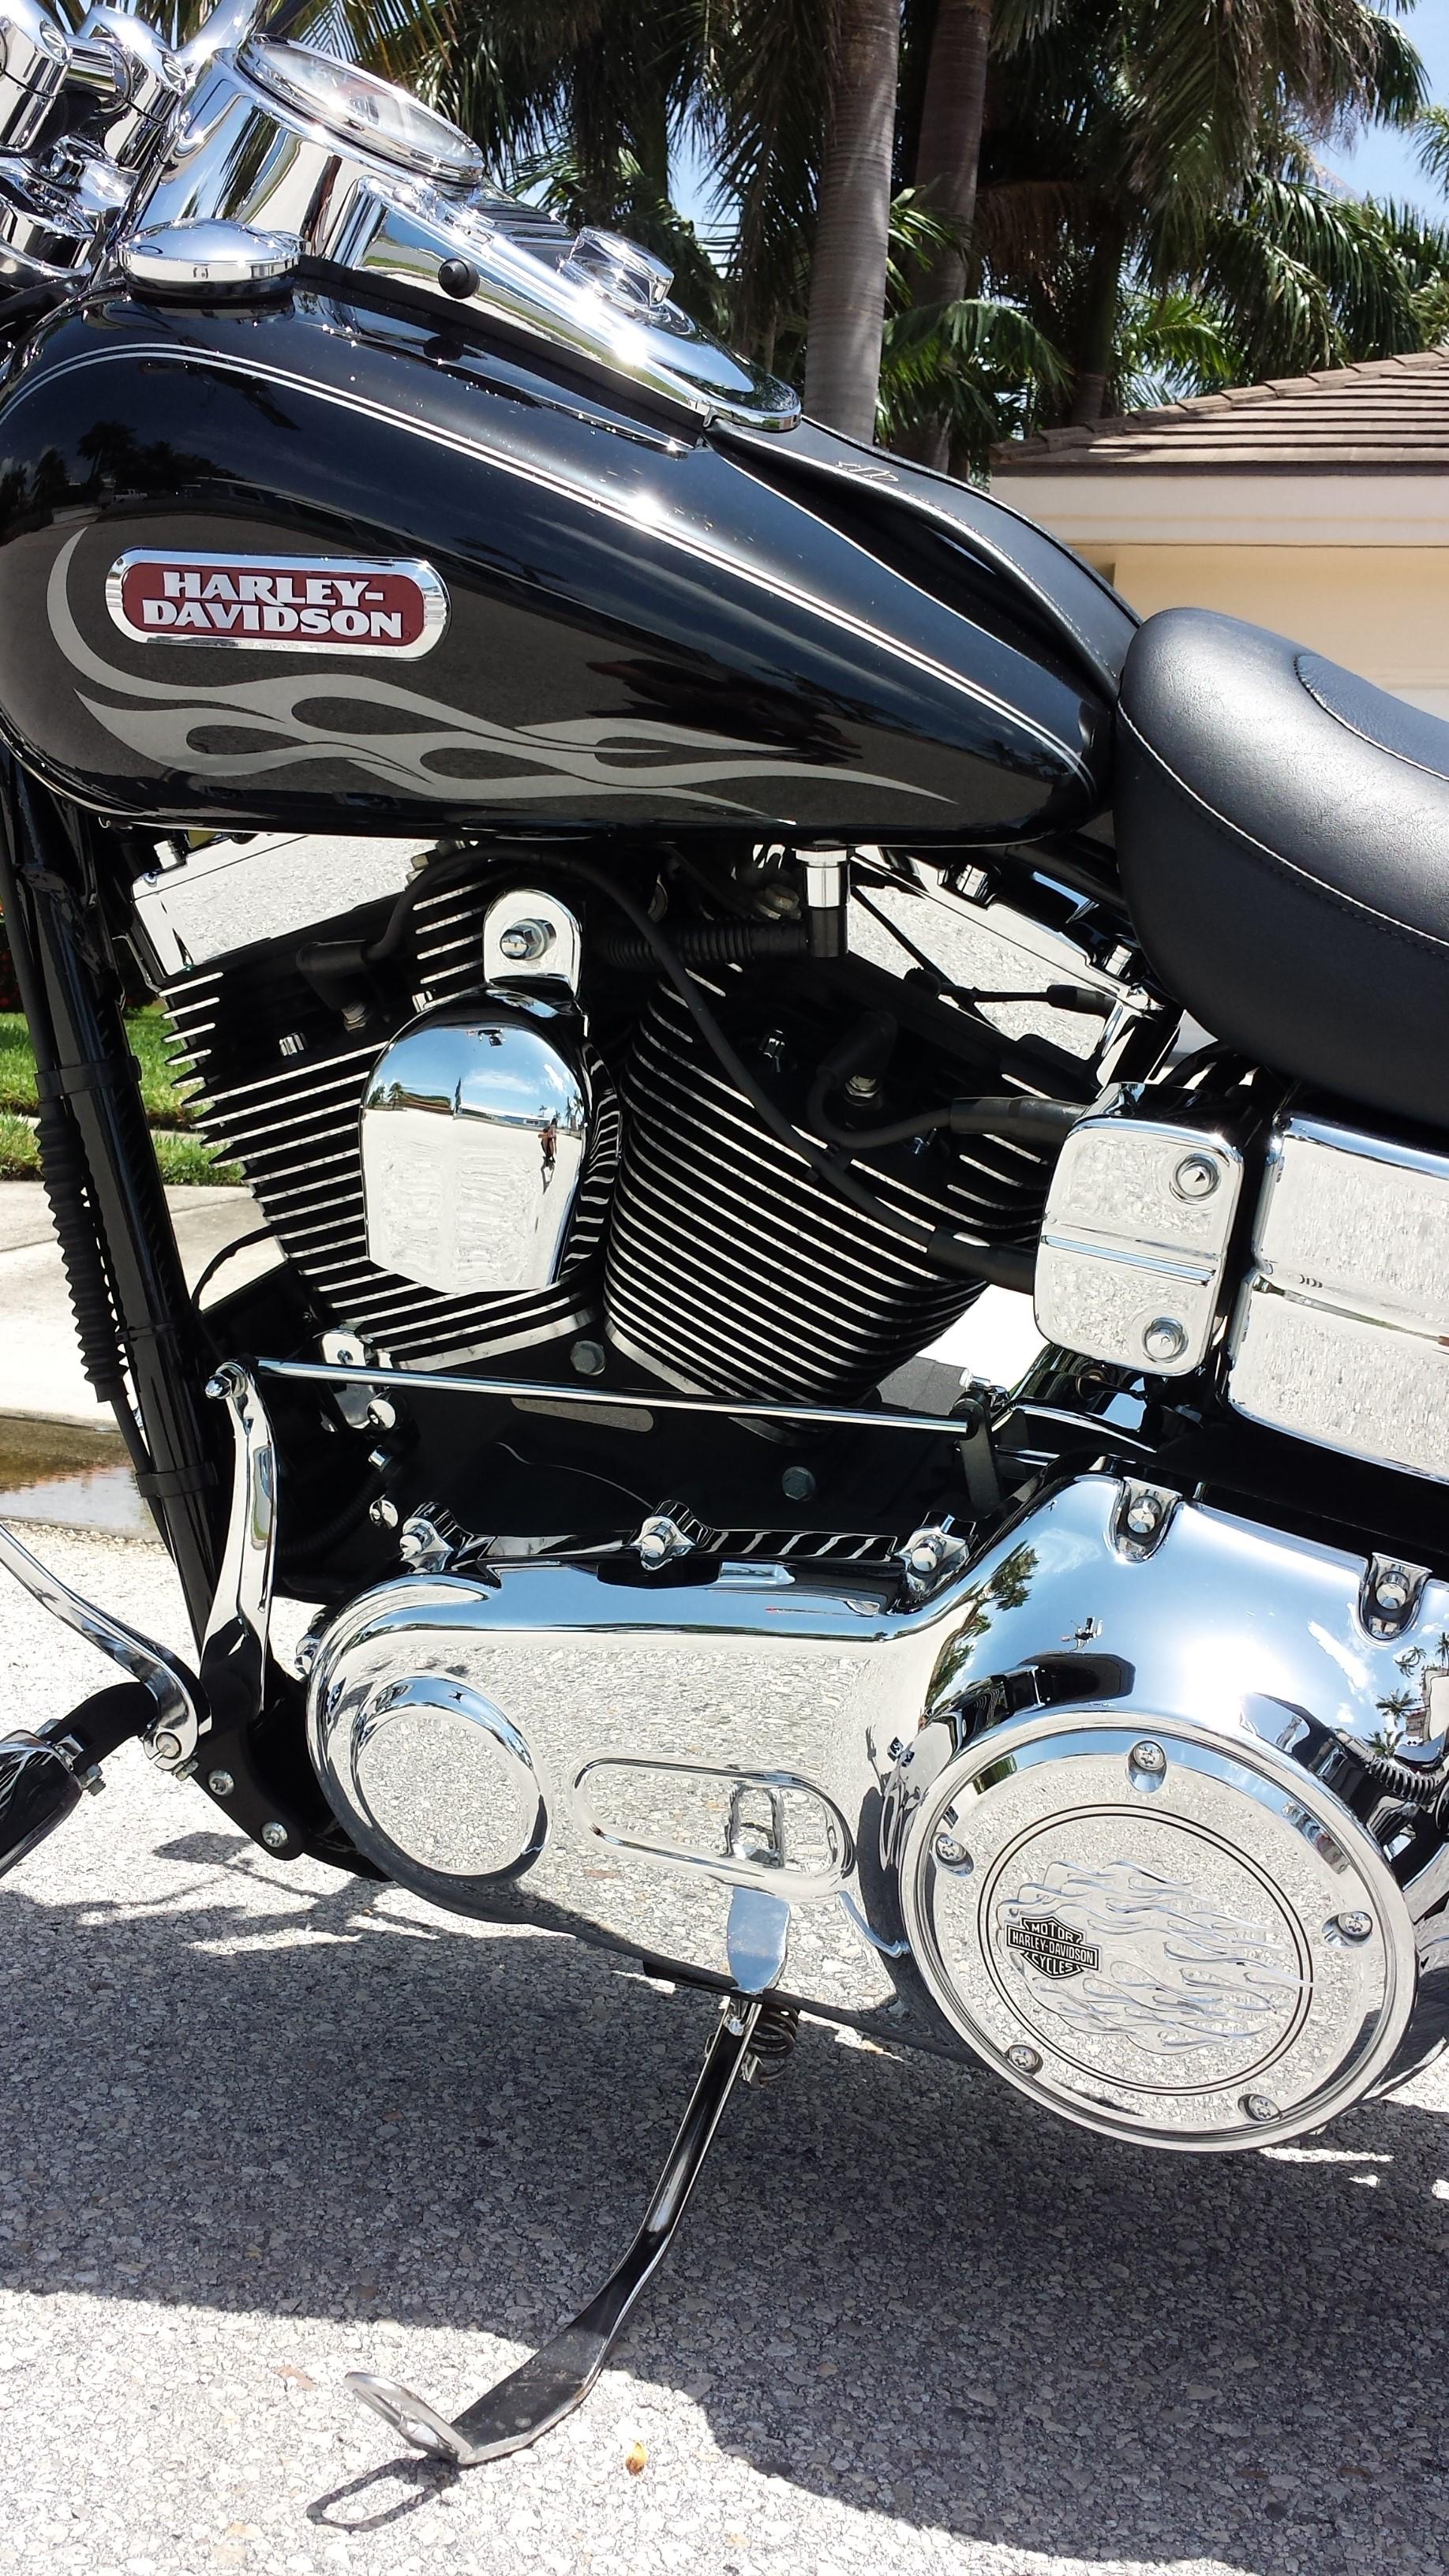 Motorcycles harley-davidson for sale